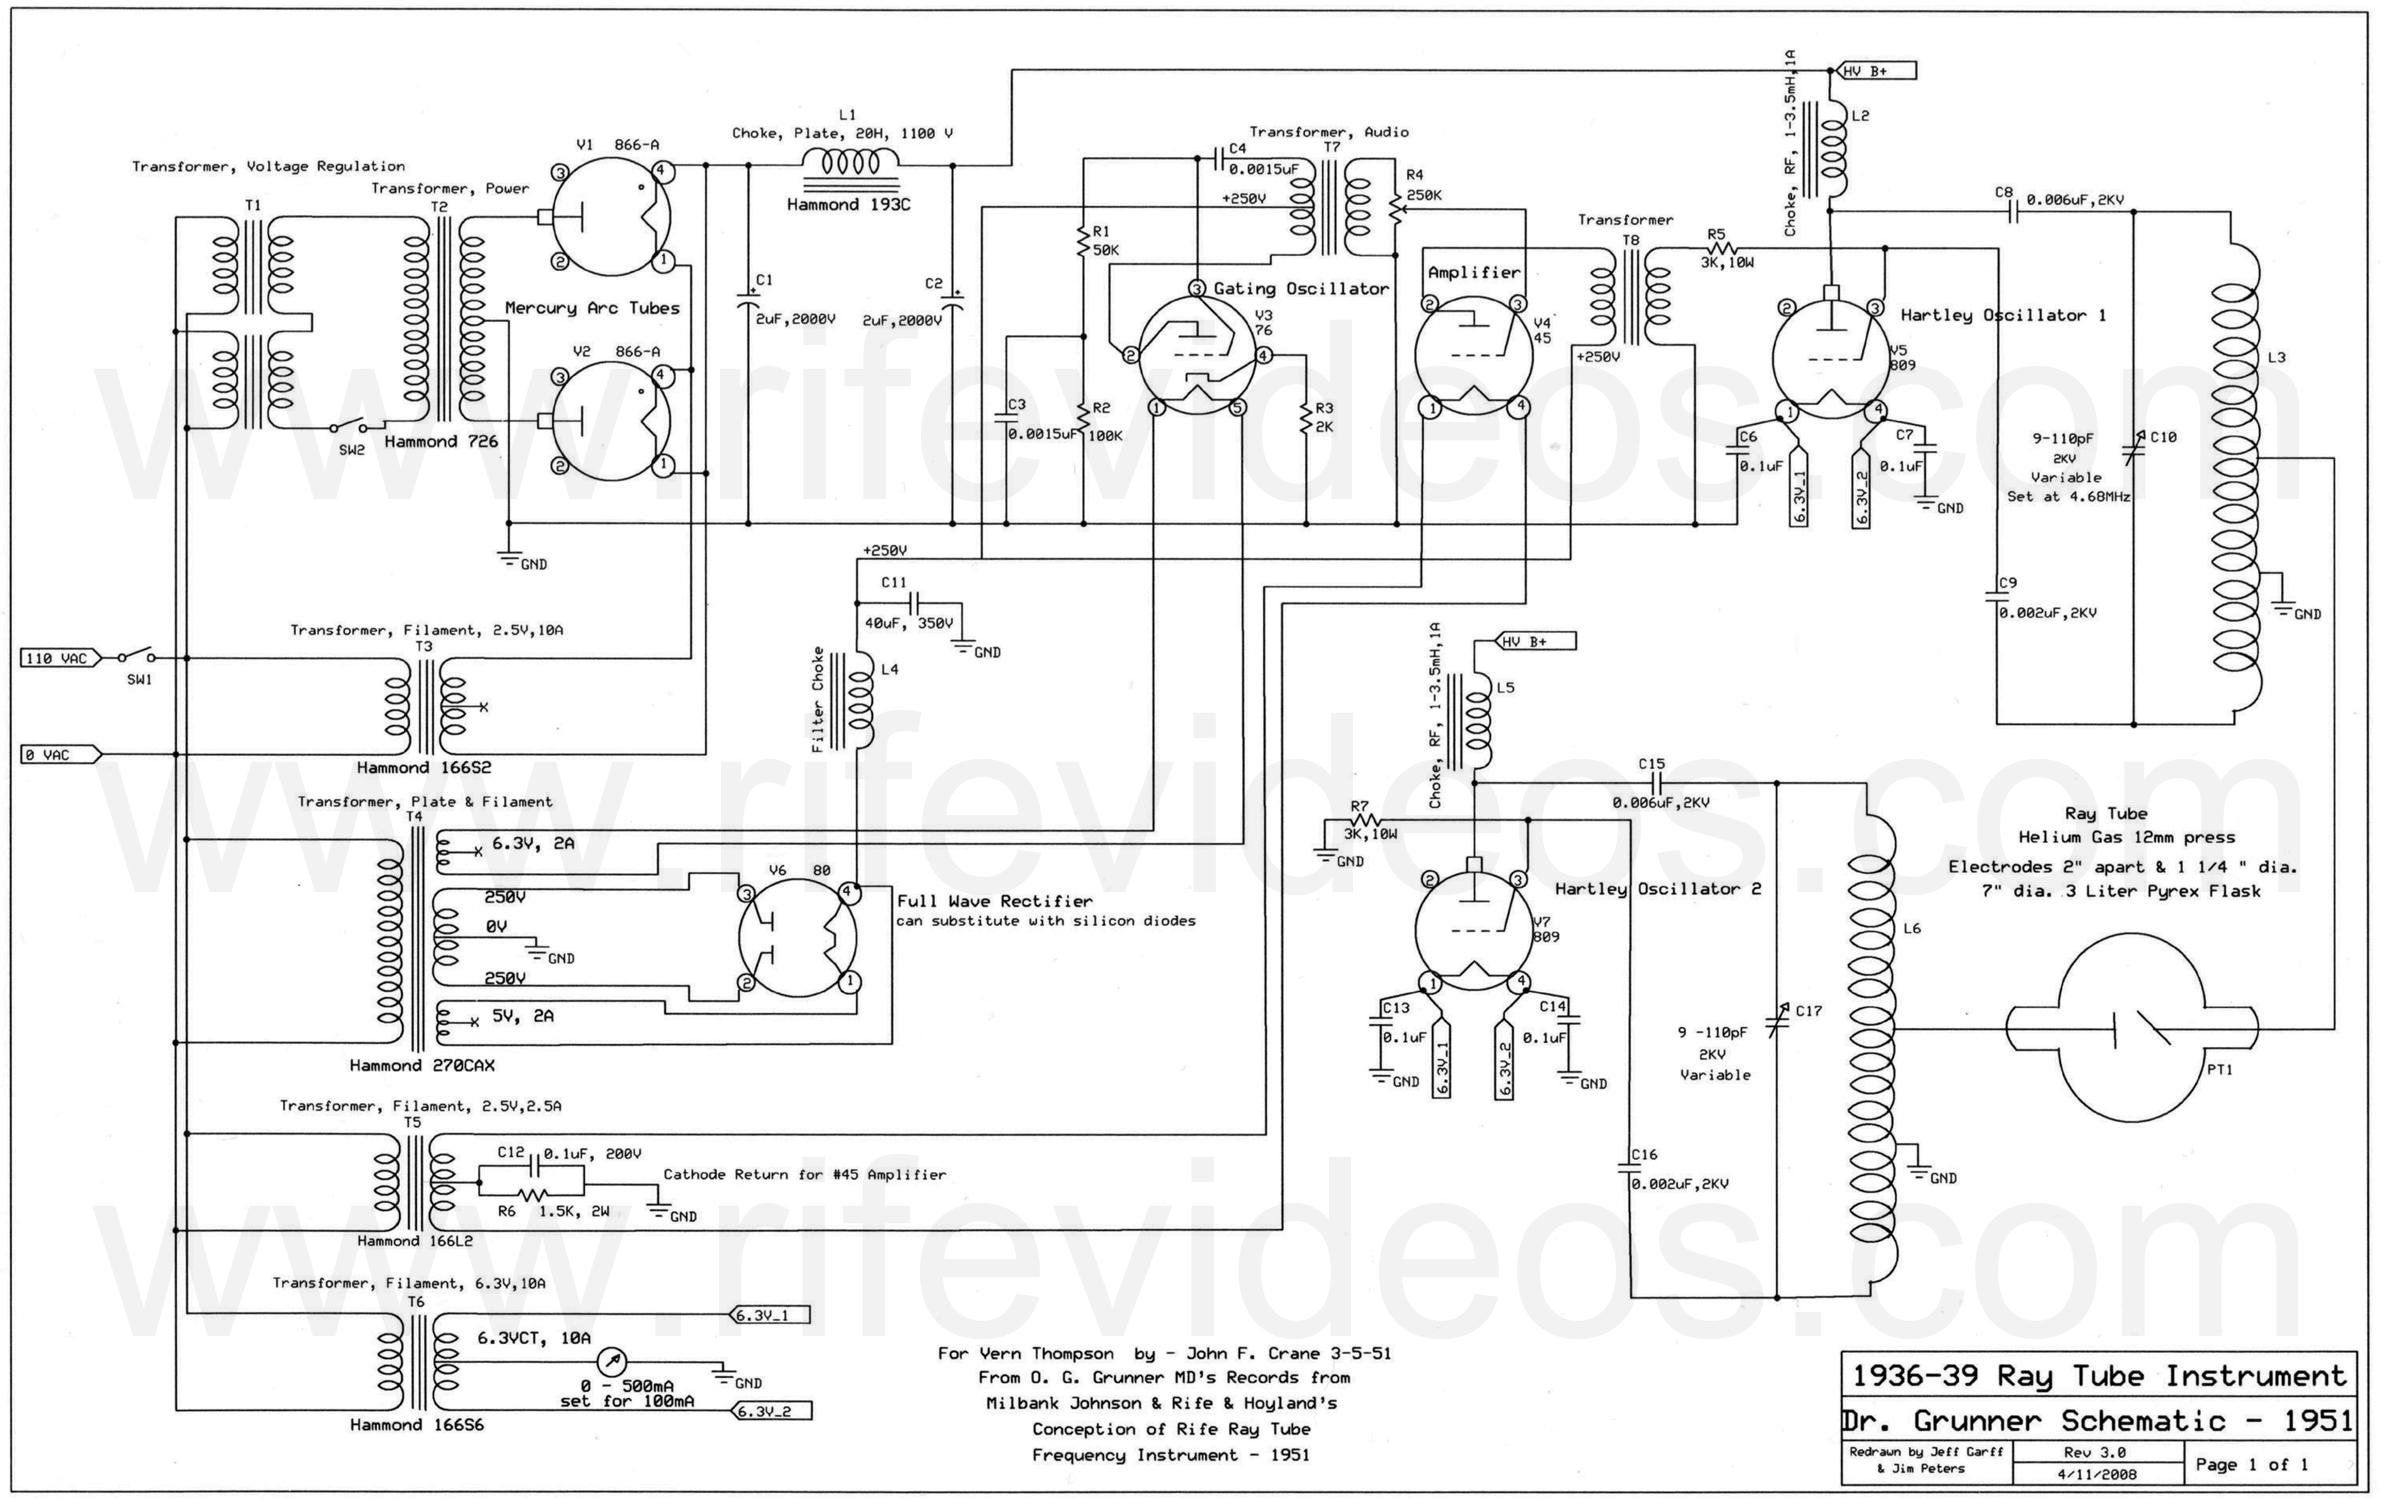 Chapter 10 The Gruner Schematic of Philip Hoyland's Beam Ray ... on